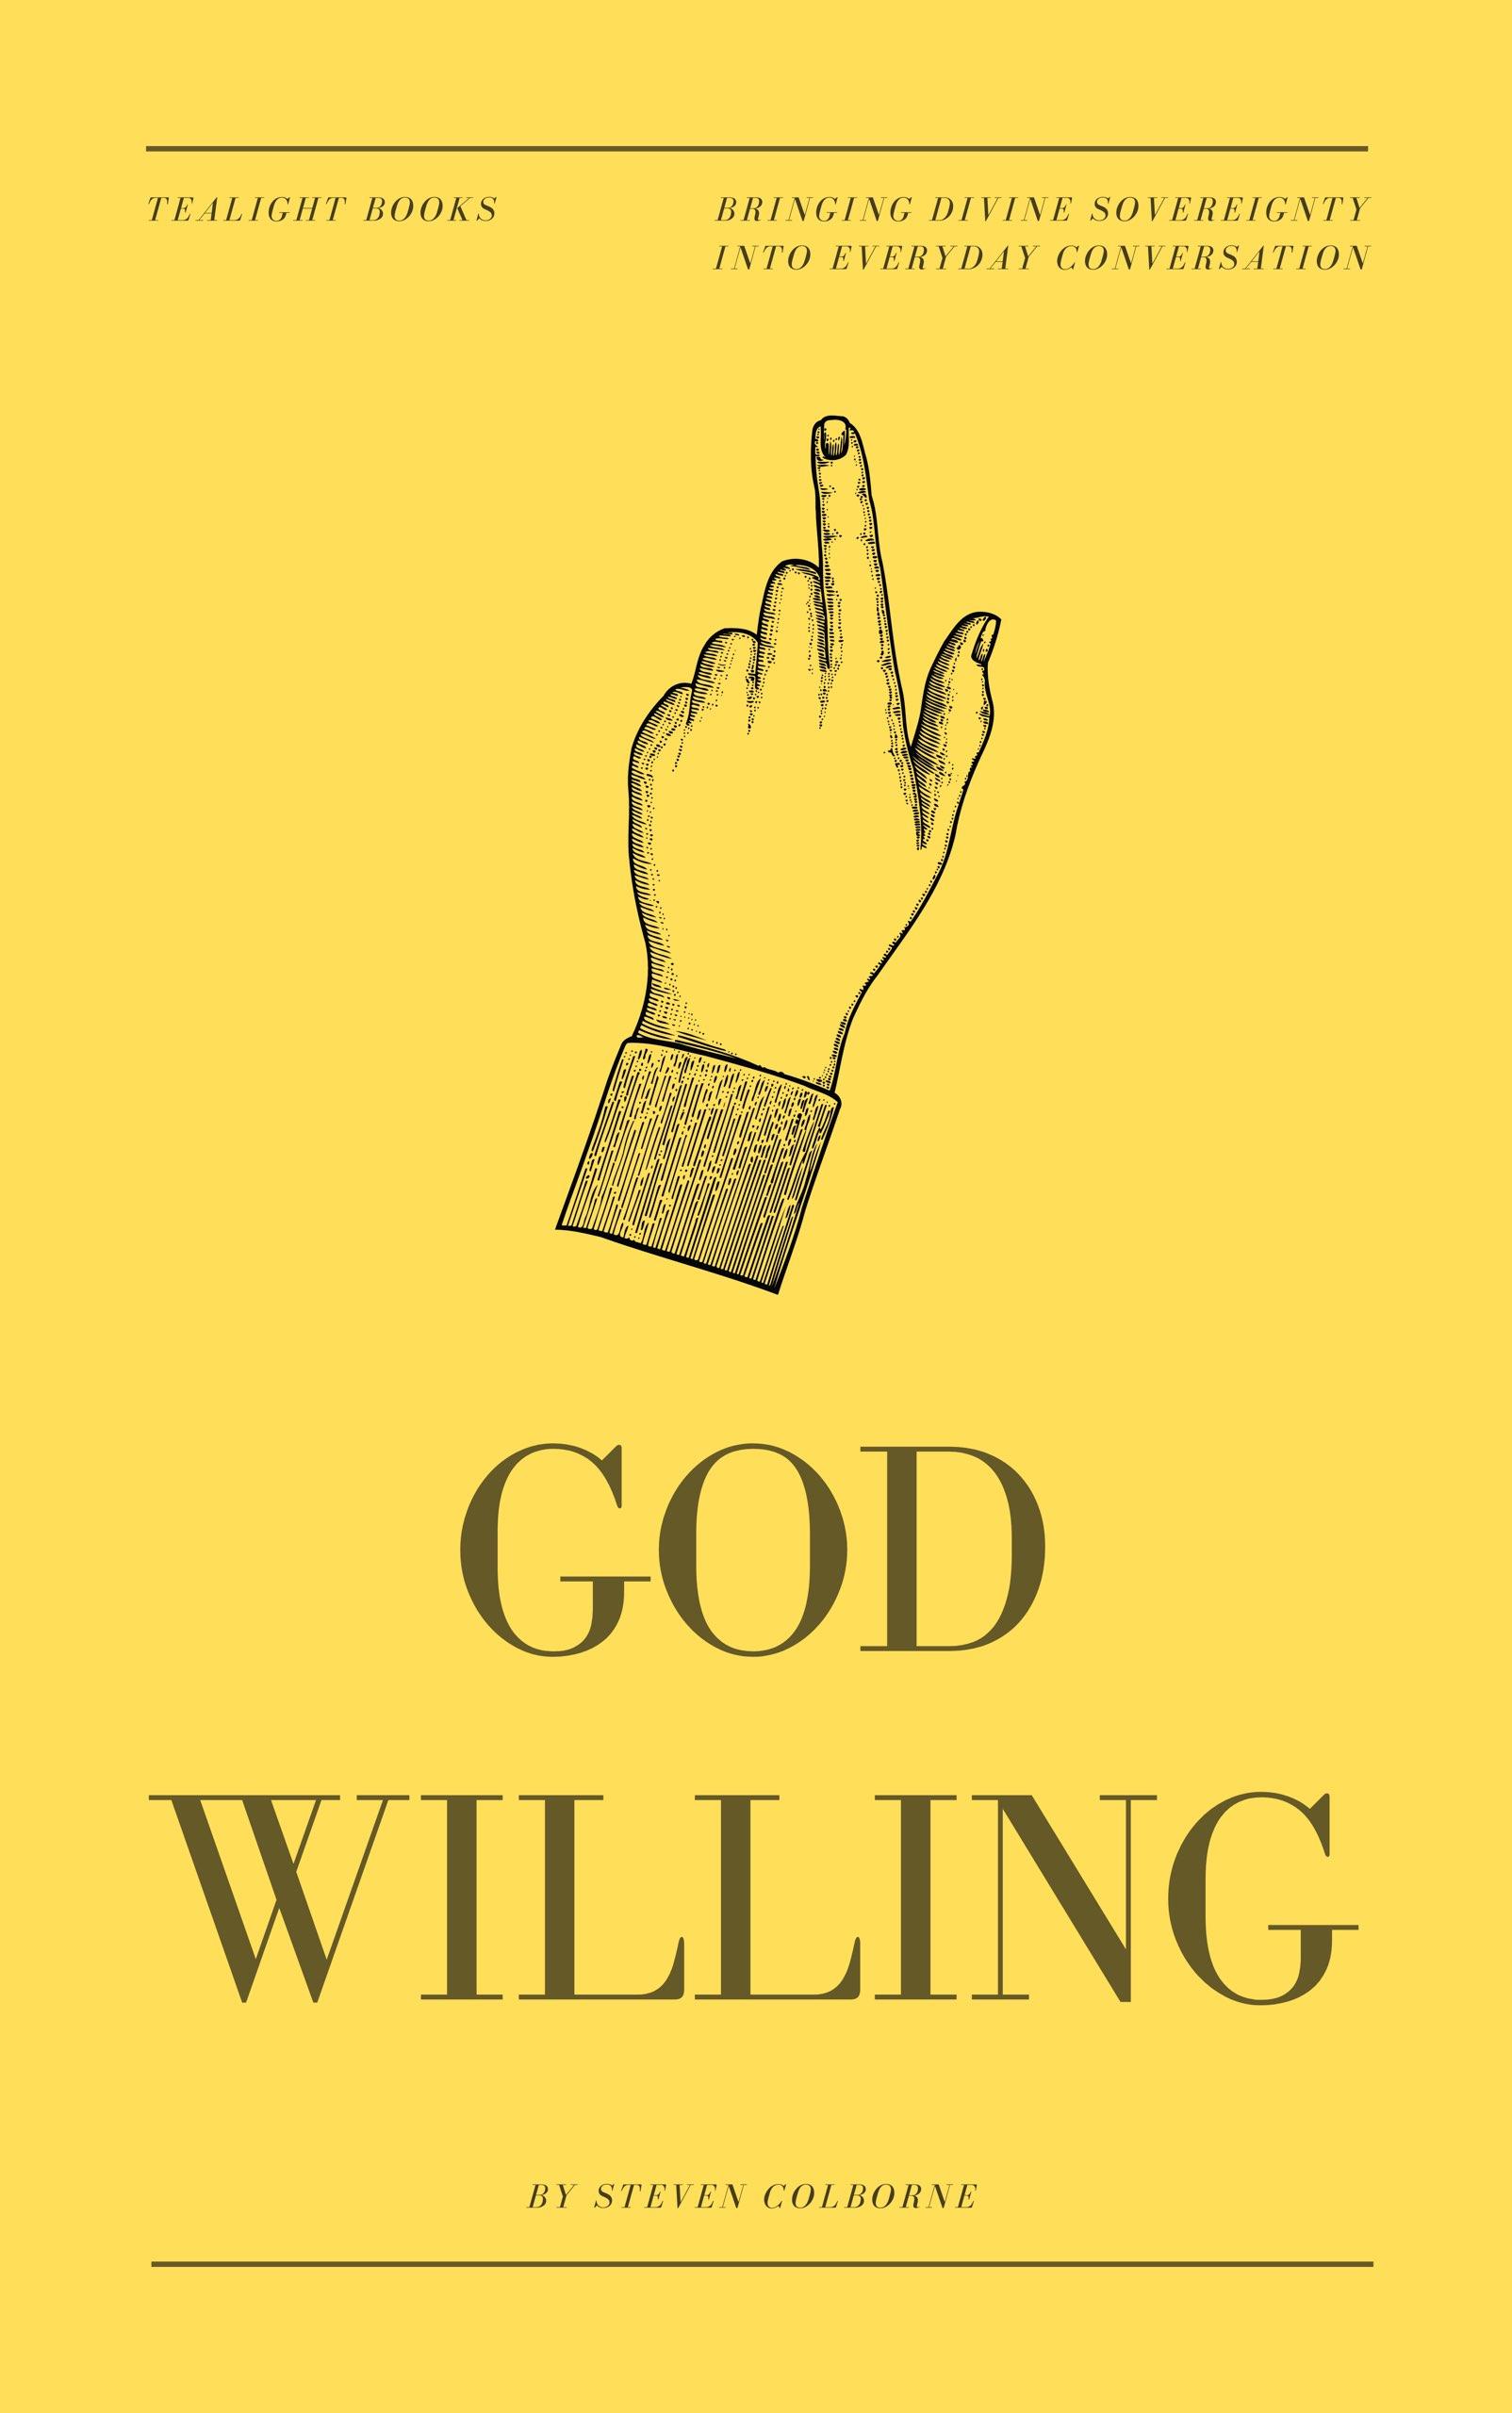 God Willing by Steven Colborne (cover)